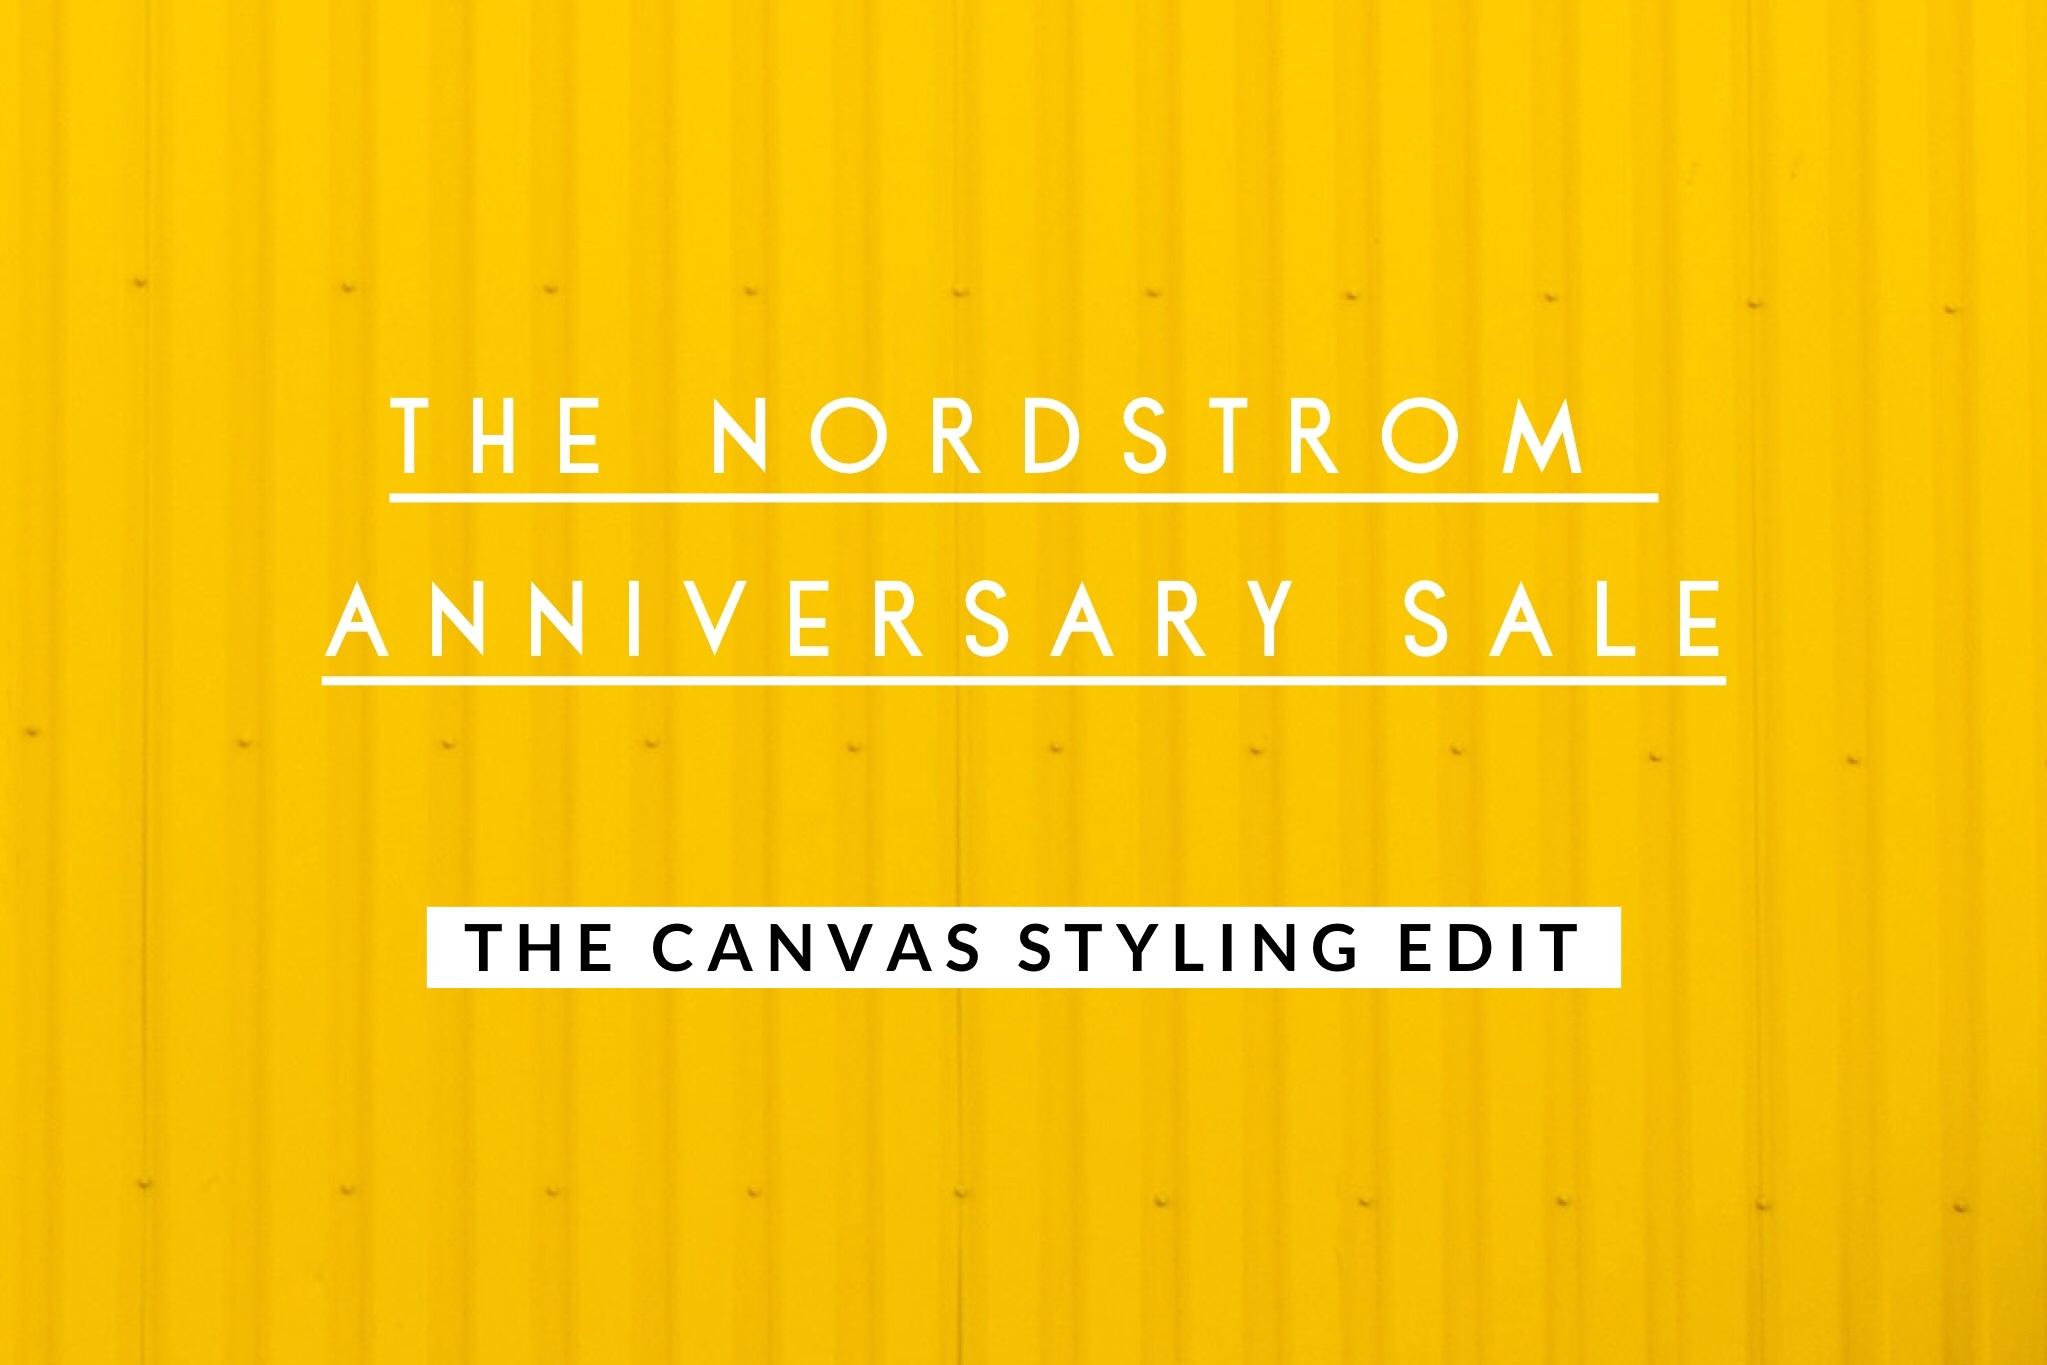 Nordstrom-Anniversary-Sale-Canvas-Styling.jpg